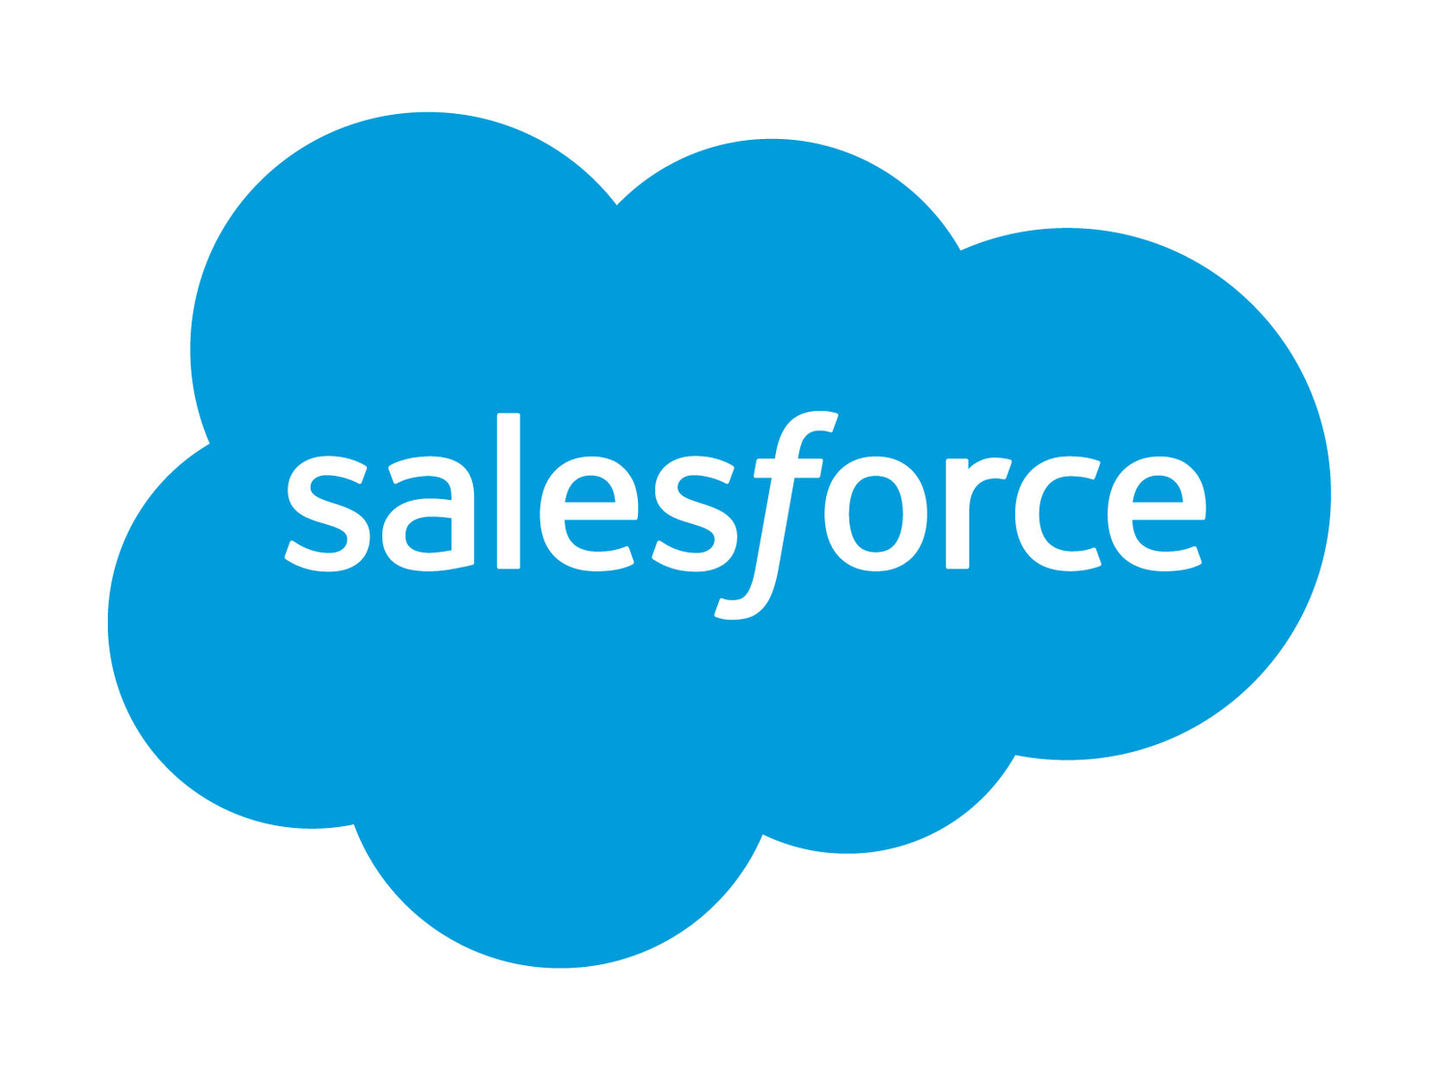 2019sponsor_logos_4-3-salesforce.jpg